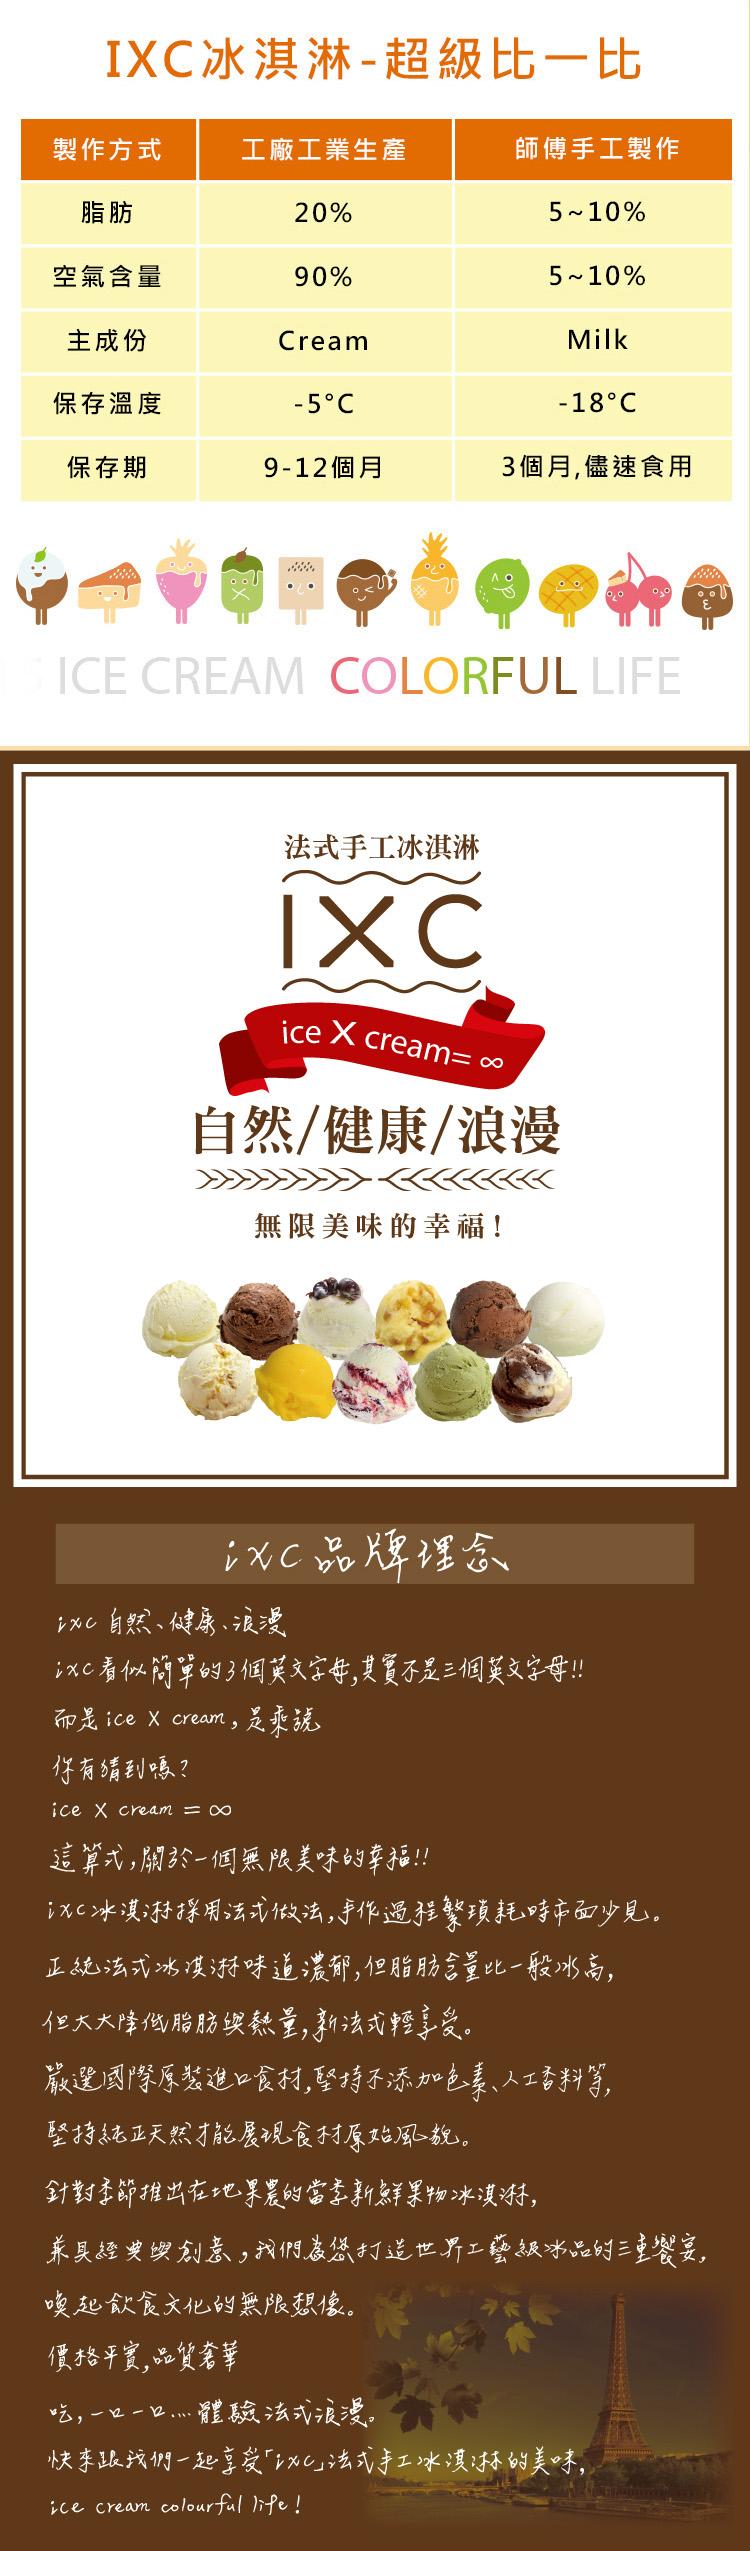 "IXC法式手工冰淇淋比一比加故事"" height="